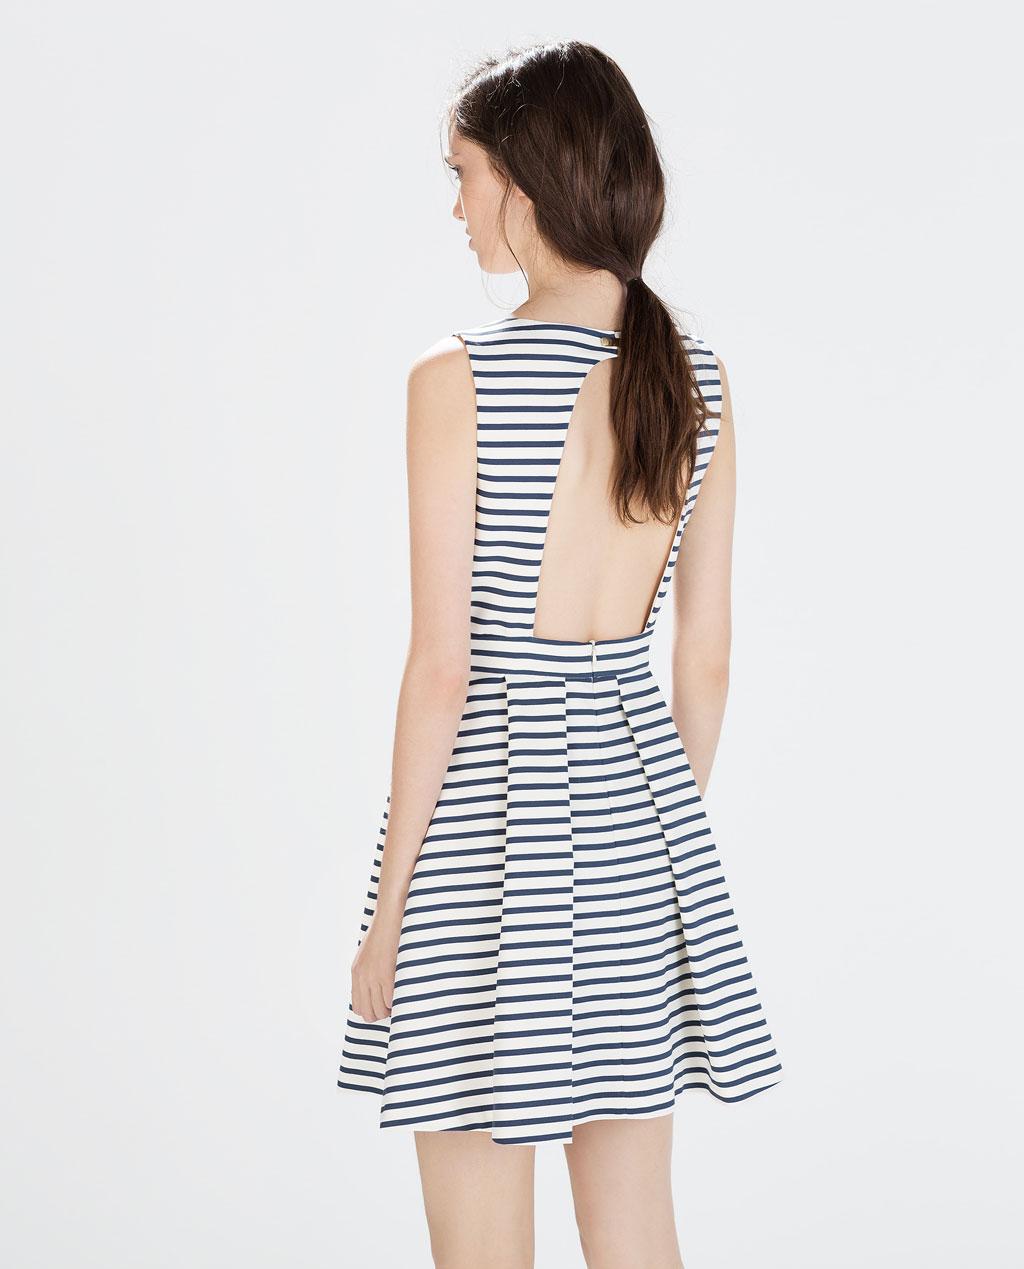 ZARA - Gestreepte jurk met rugdecolleté - €50